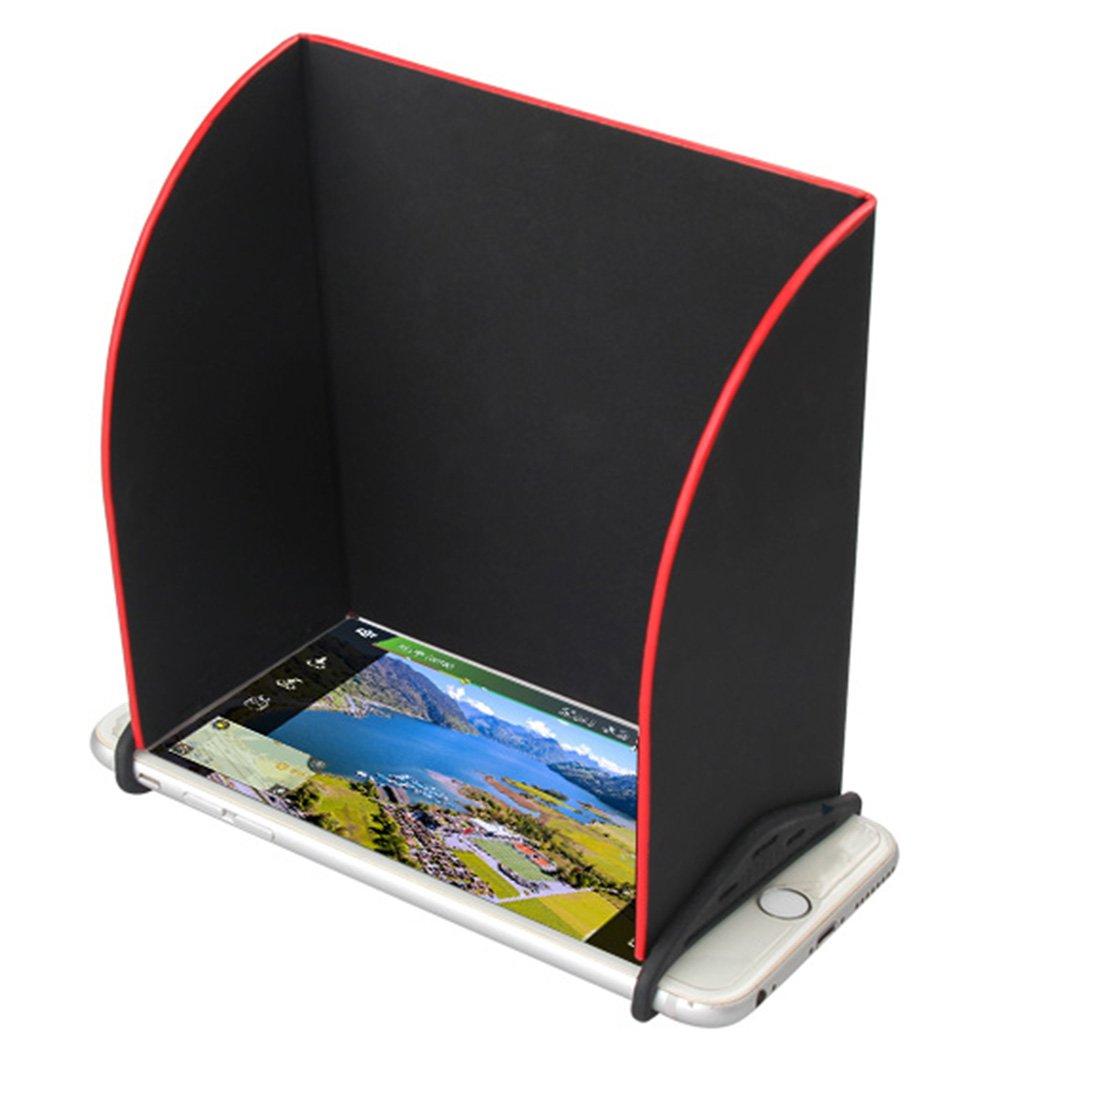 Foxom Telecomando Del Monitor Parasole Parasole Copertura Cappuccio Smartphone Tablet iPad Parasole Per DJI Mavic Pro / Spark /Phantom 3 4, 5.5in